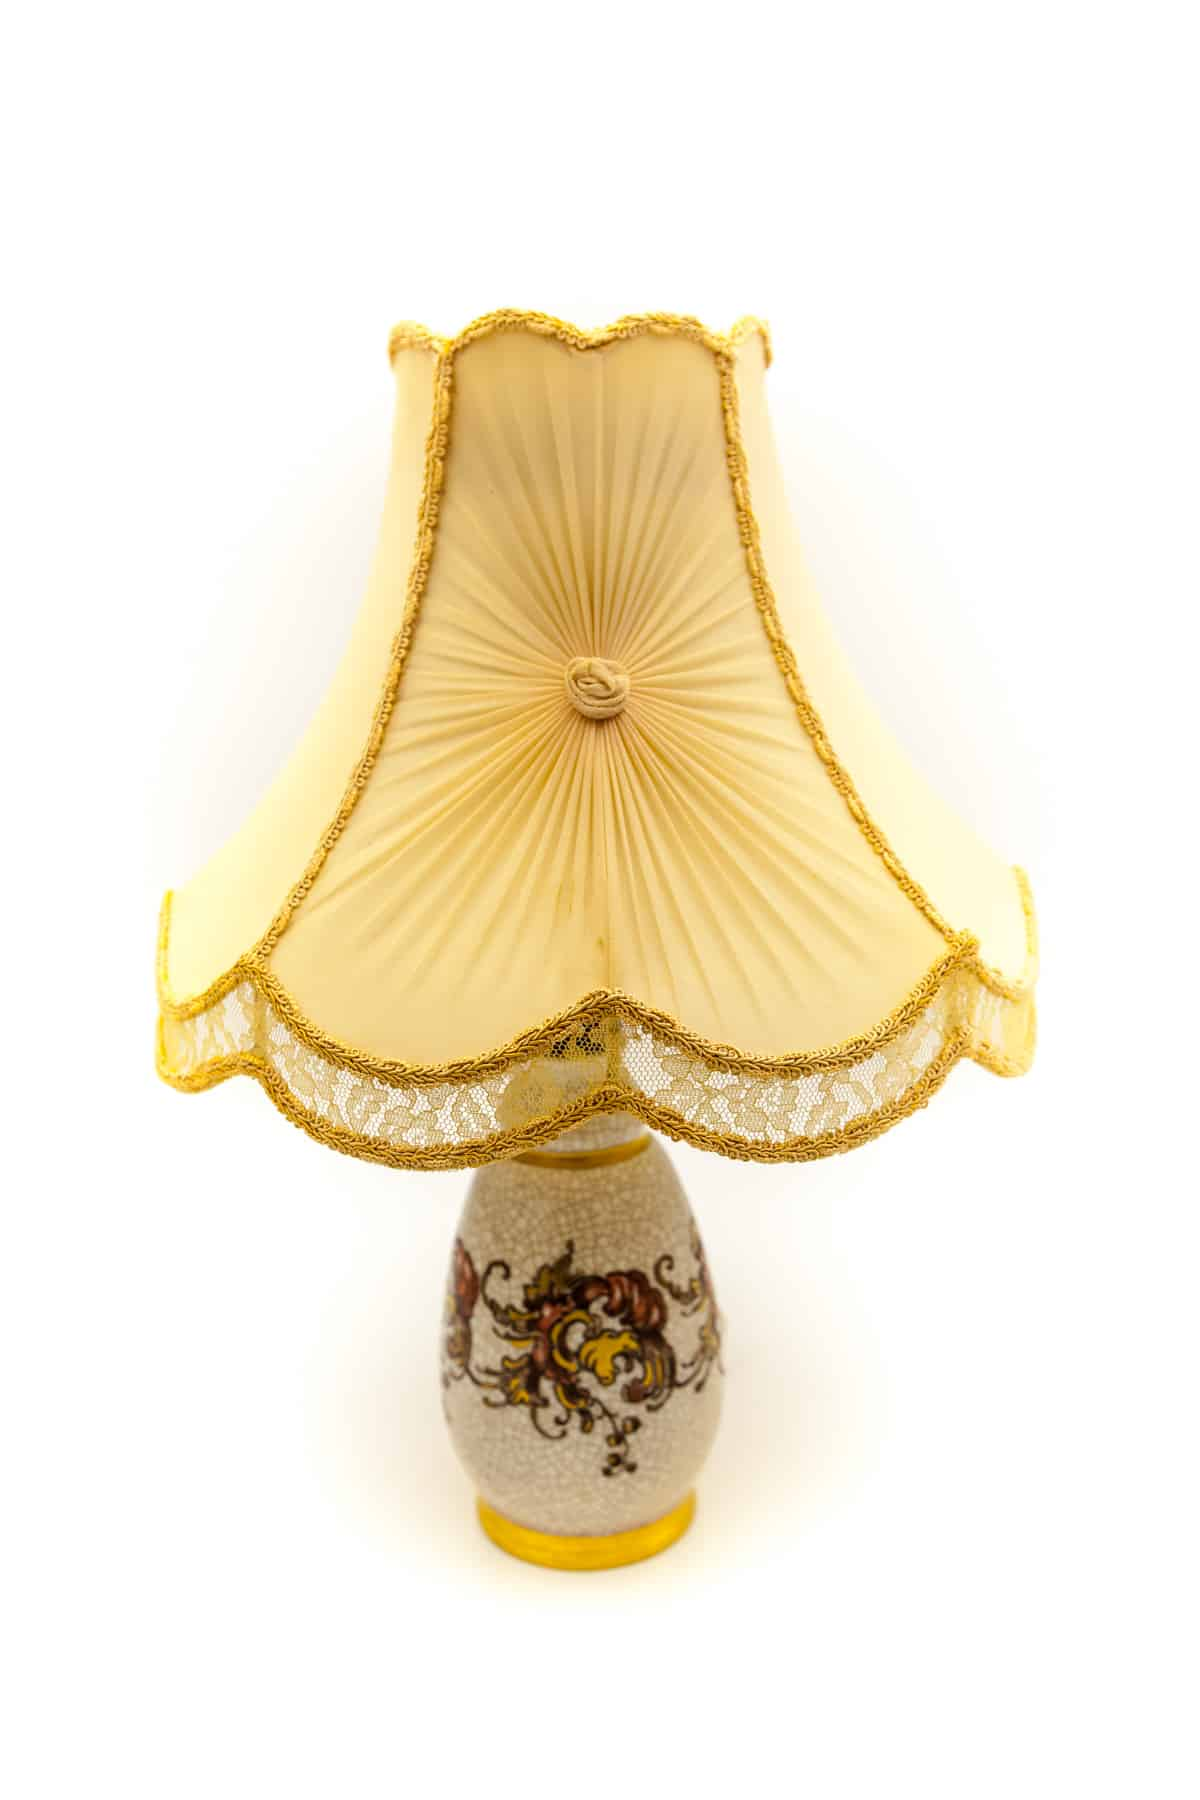 farforovaya svetilnik dahl jensen